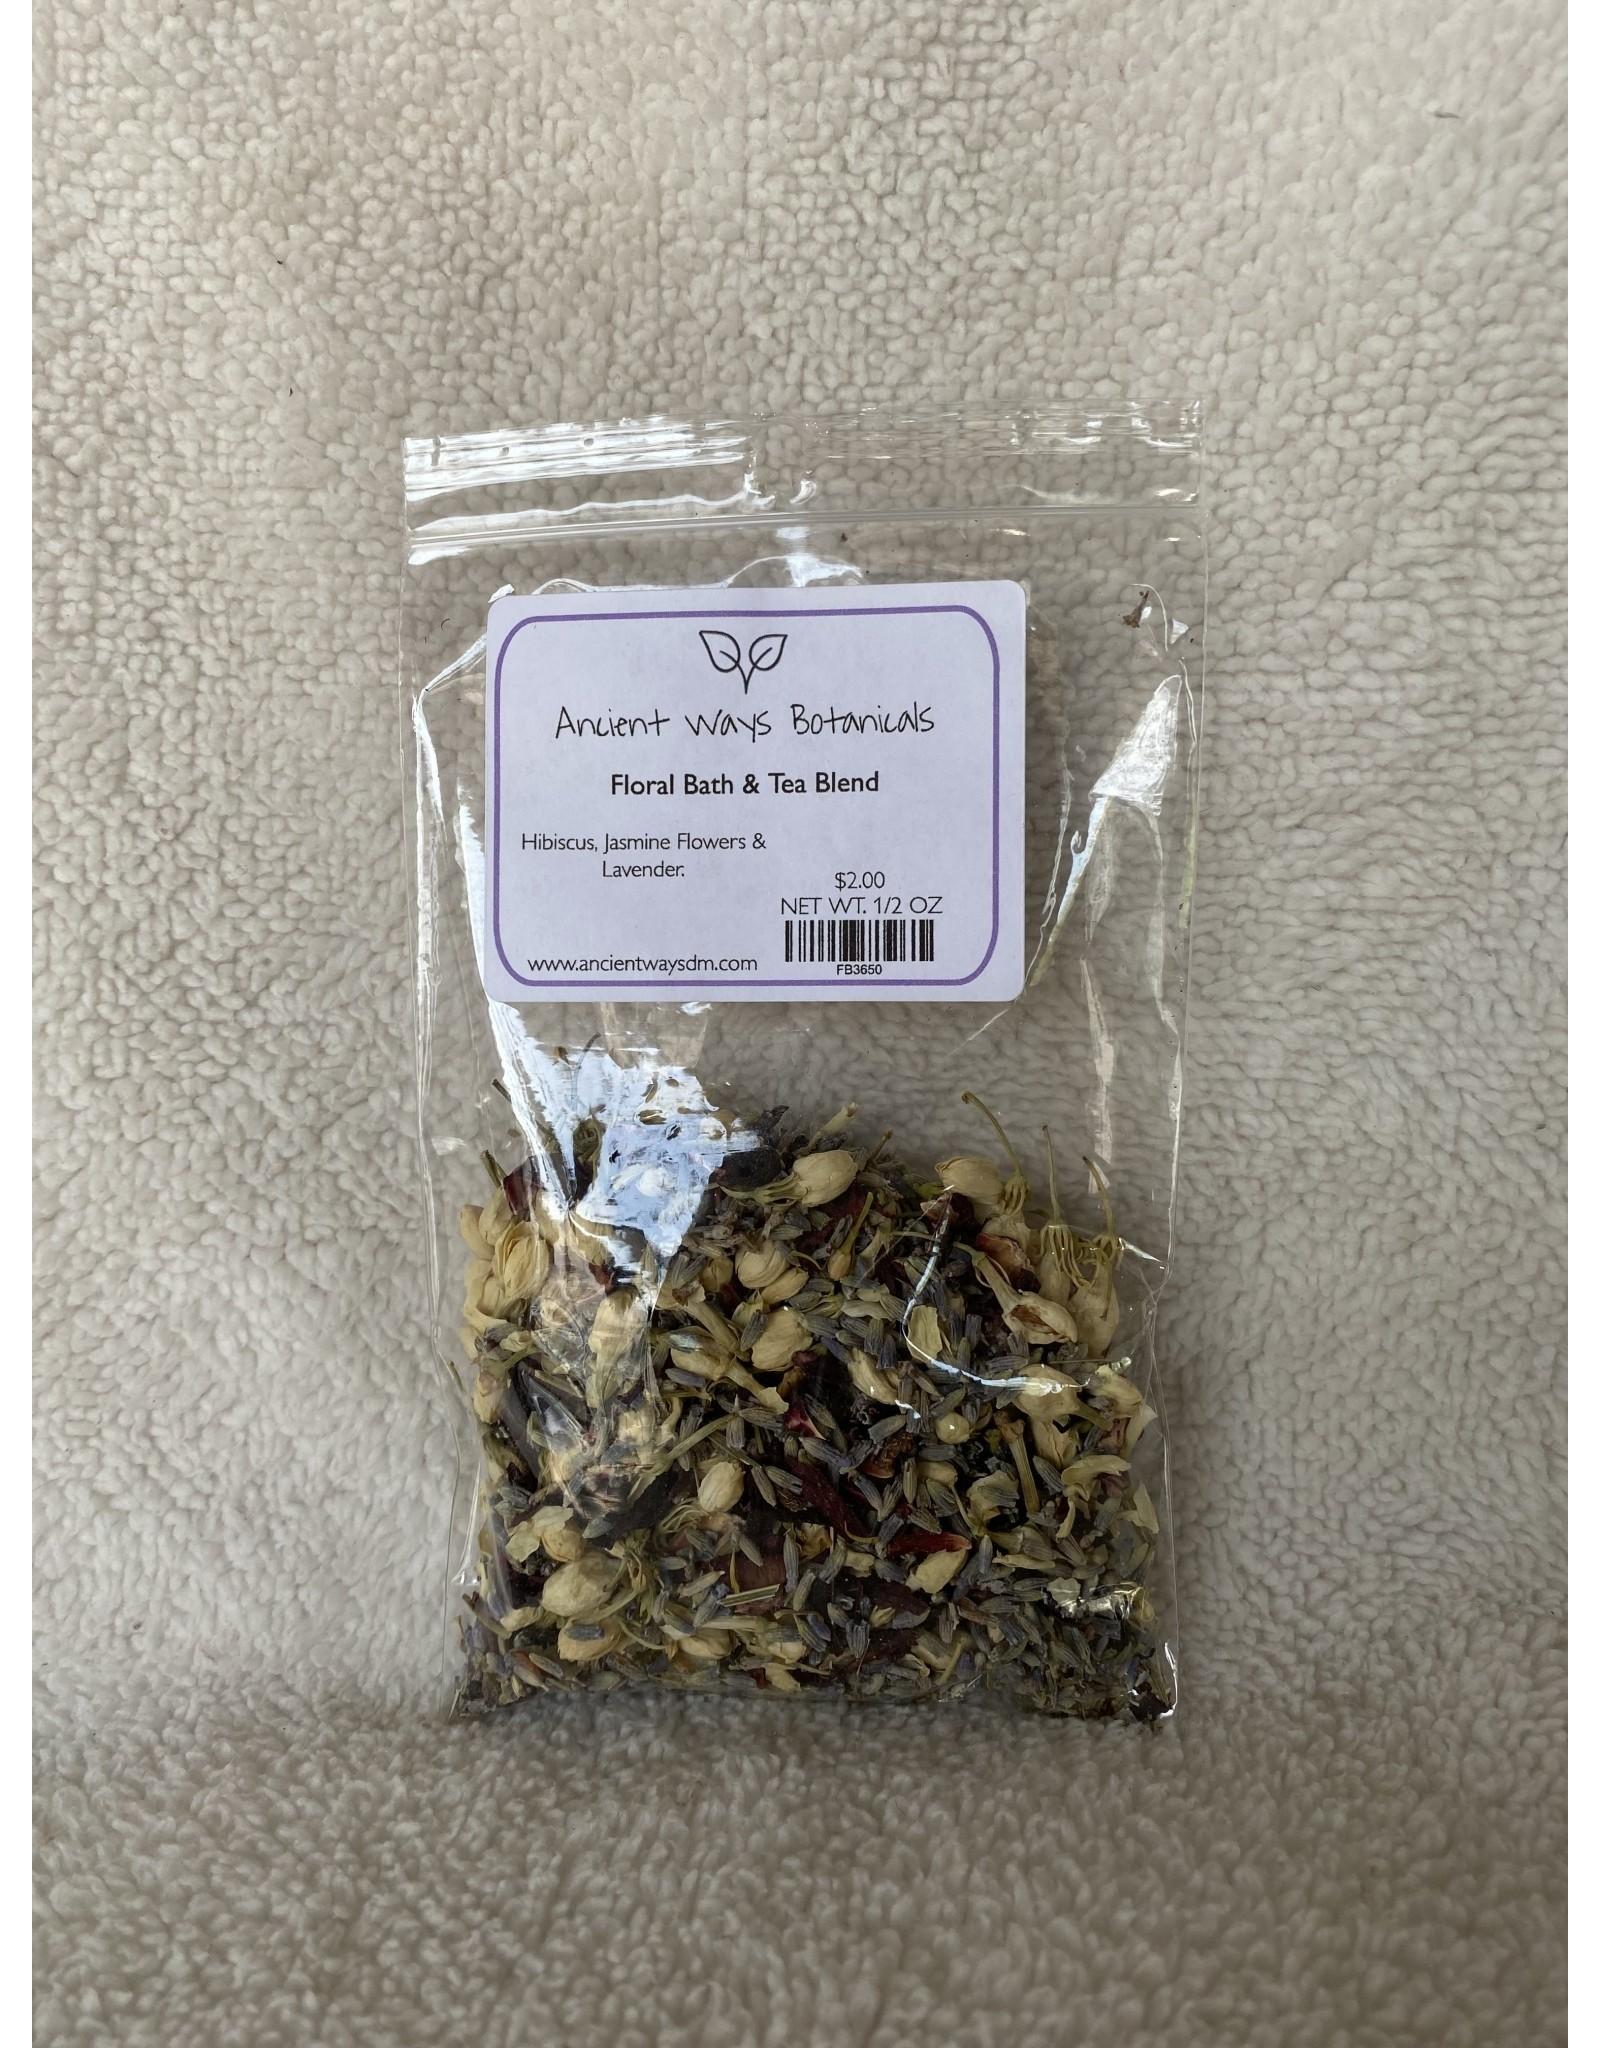 Floral Tea & Bath Blend - 1/2 oz.